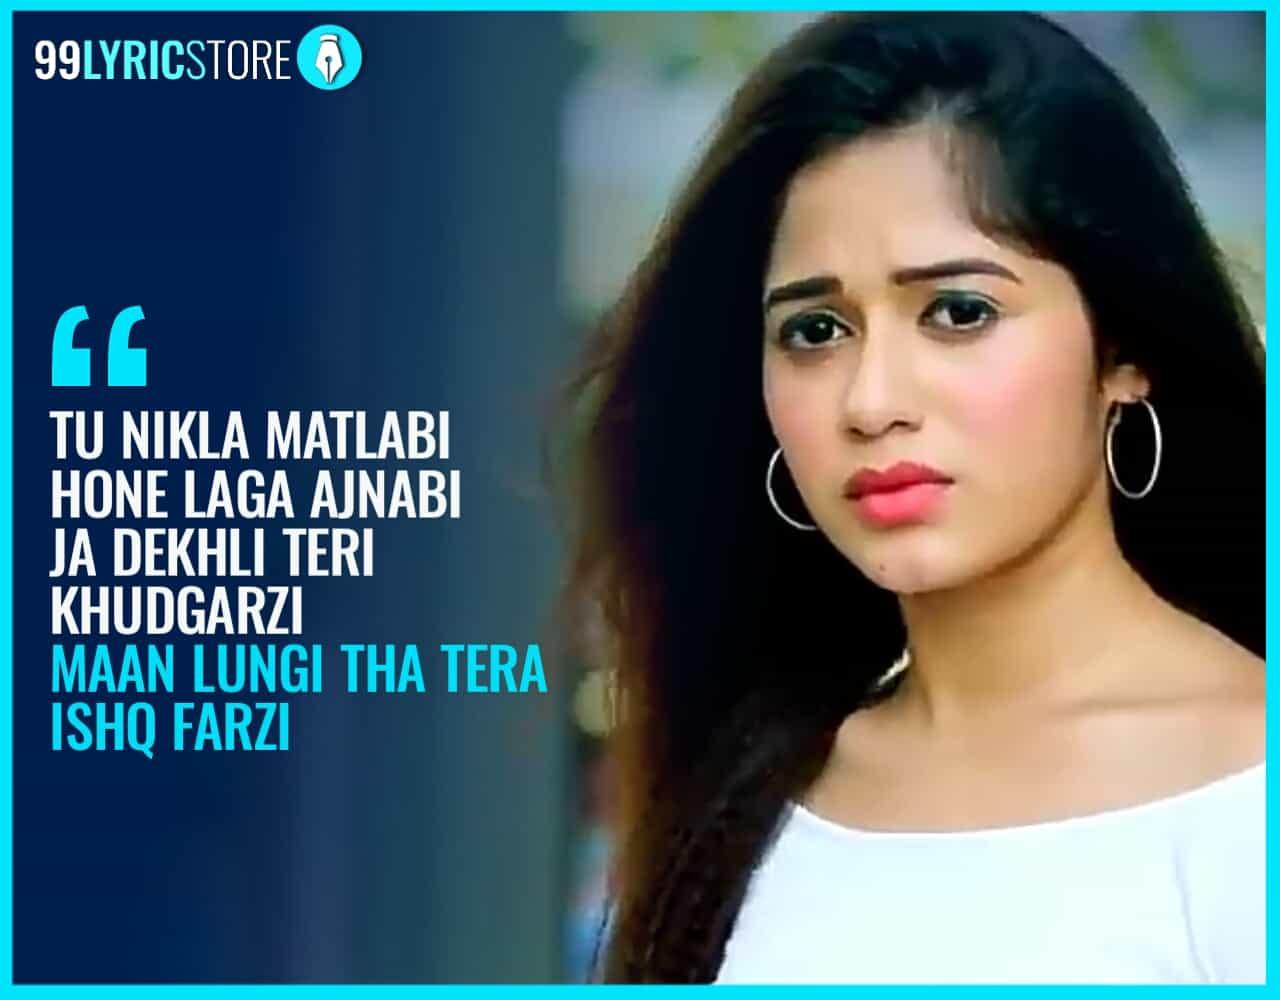 Ishq Farzi Song sung by Jannat Zubair